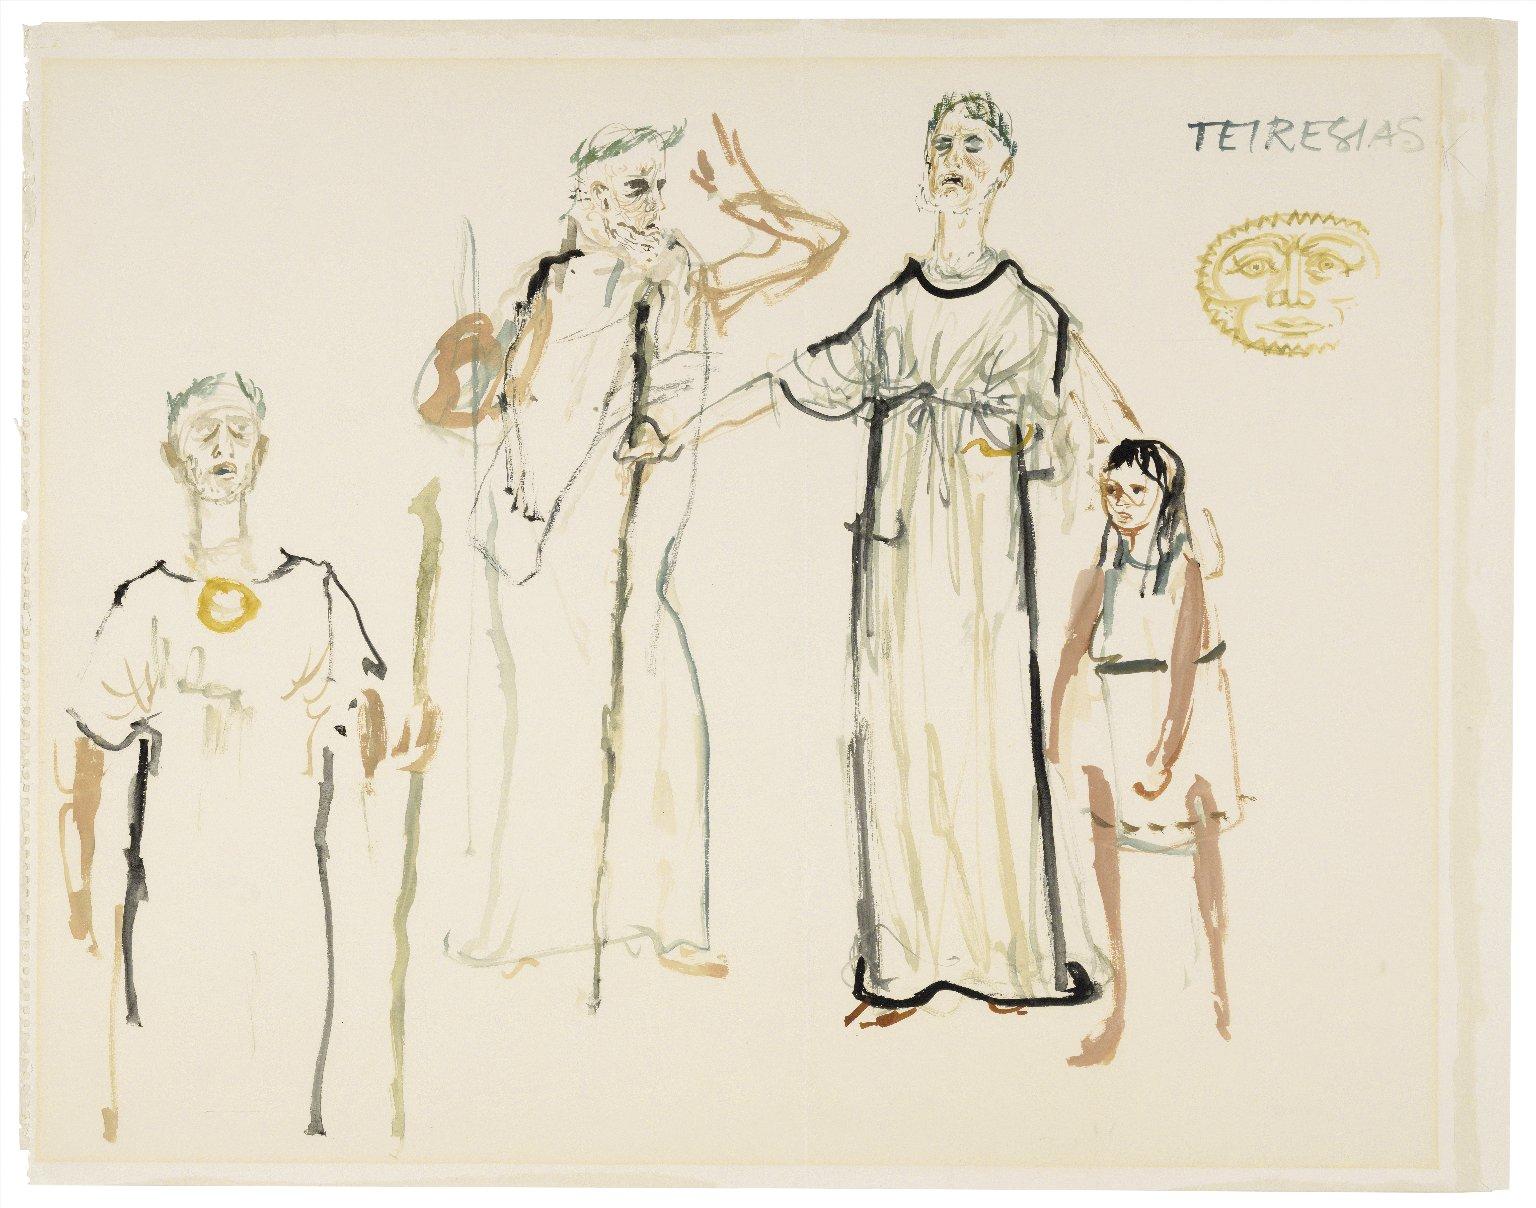 Oedipus Rex, costume drawings for Tiresias